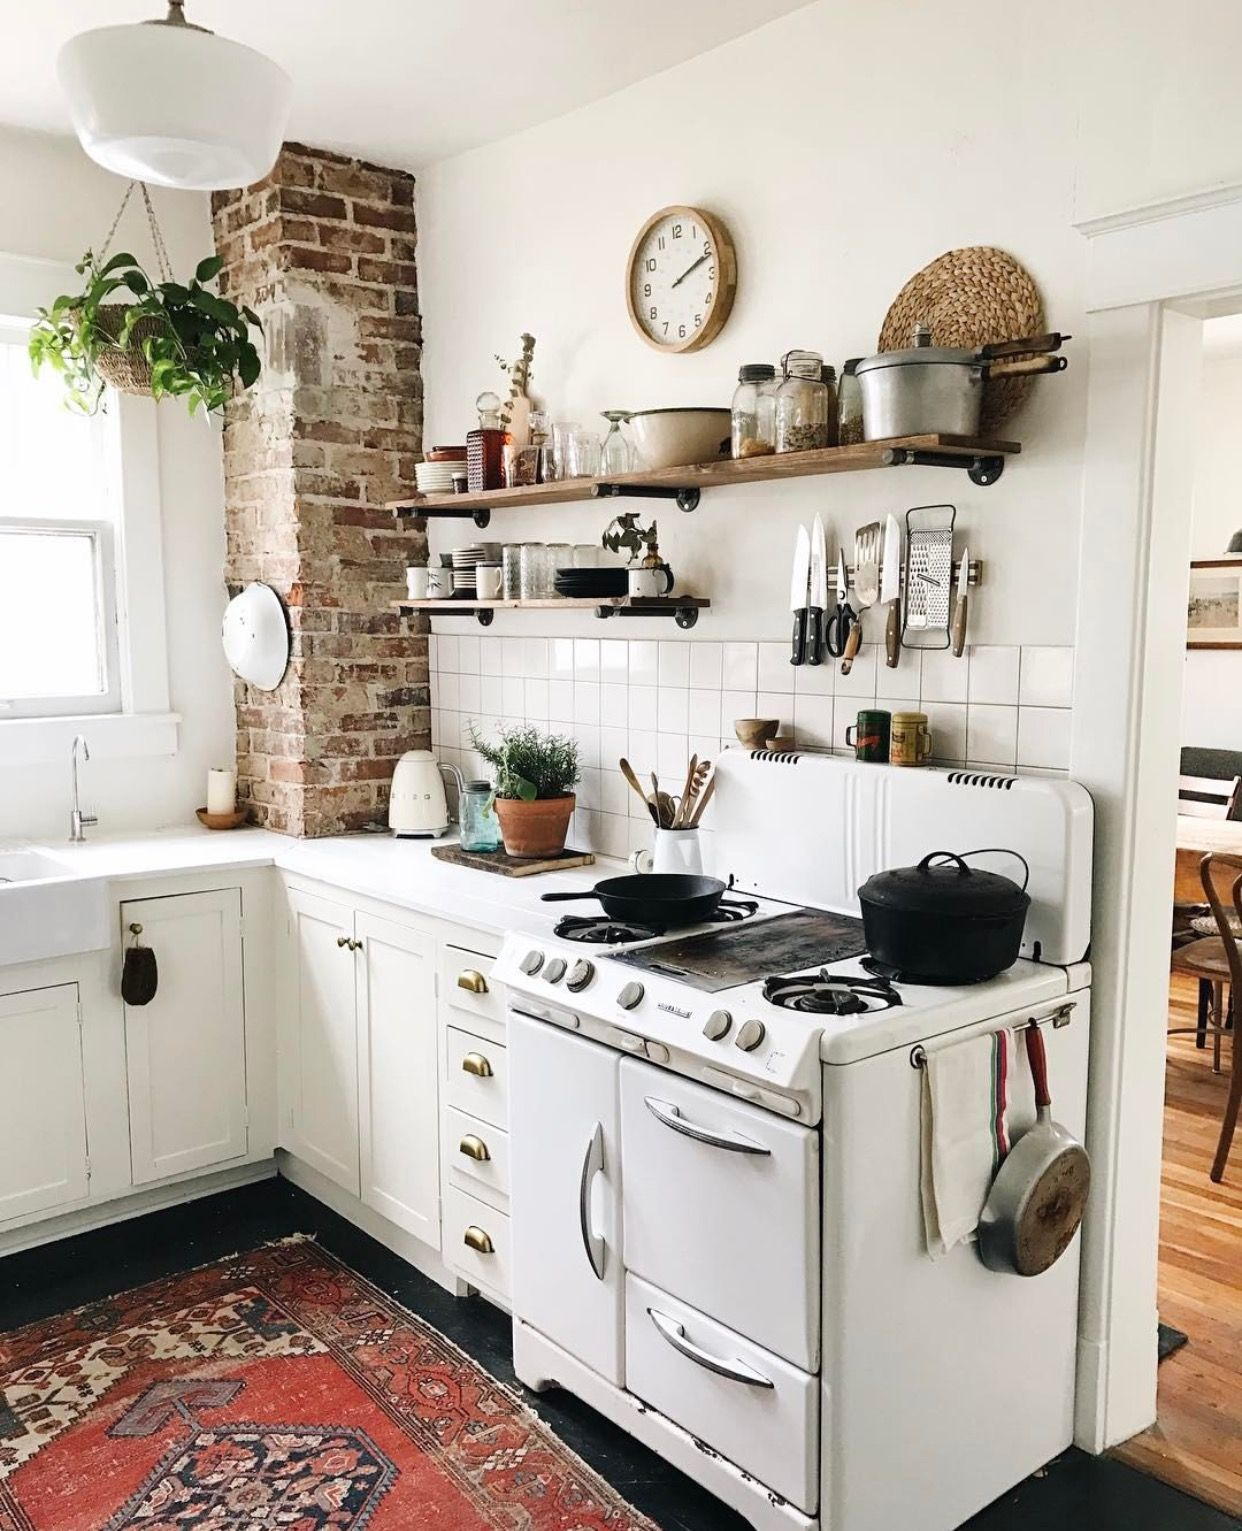 Pinterest • jessica_mardle Cottage kitchen design